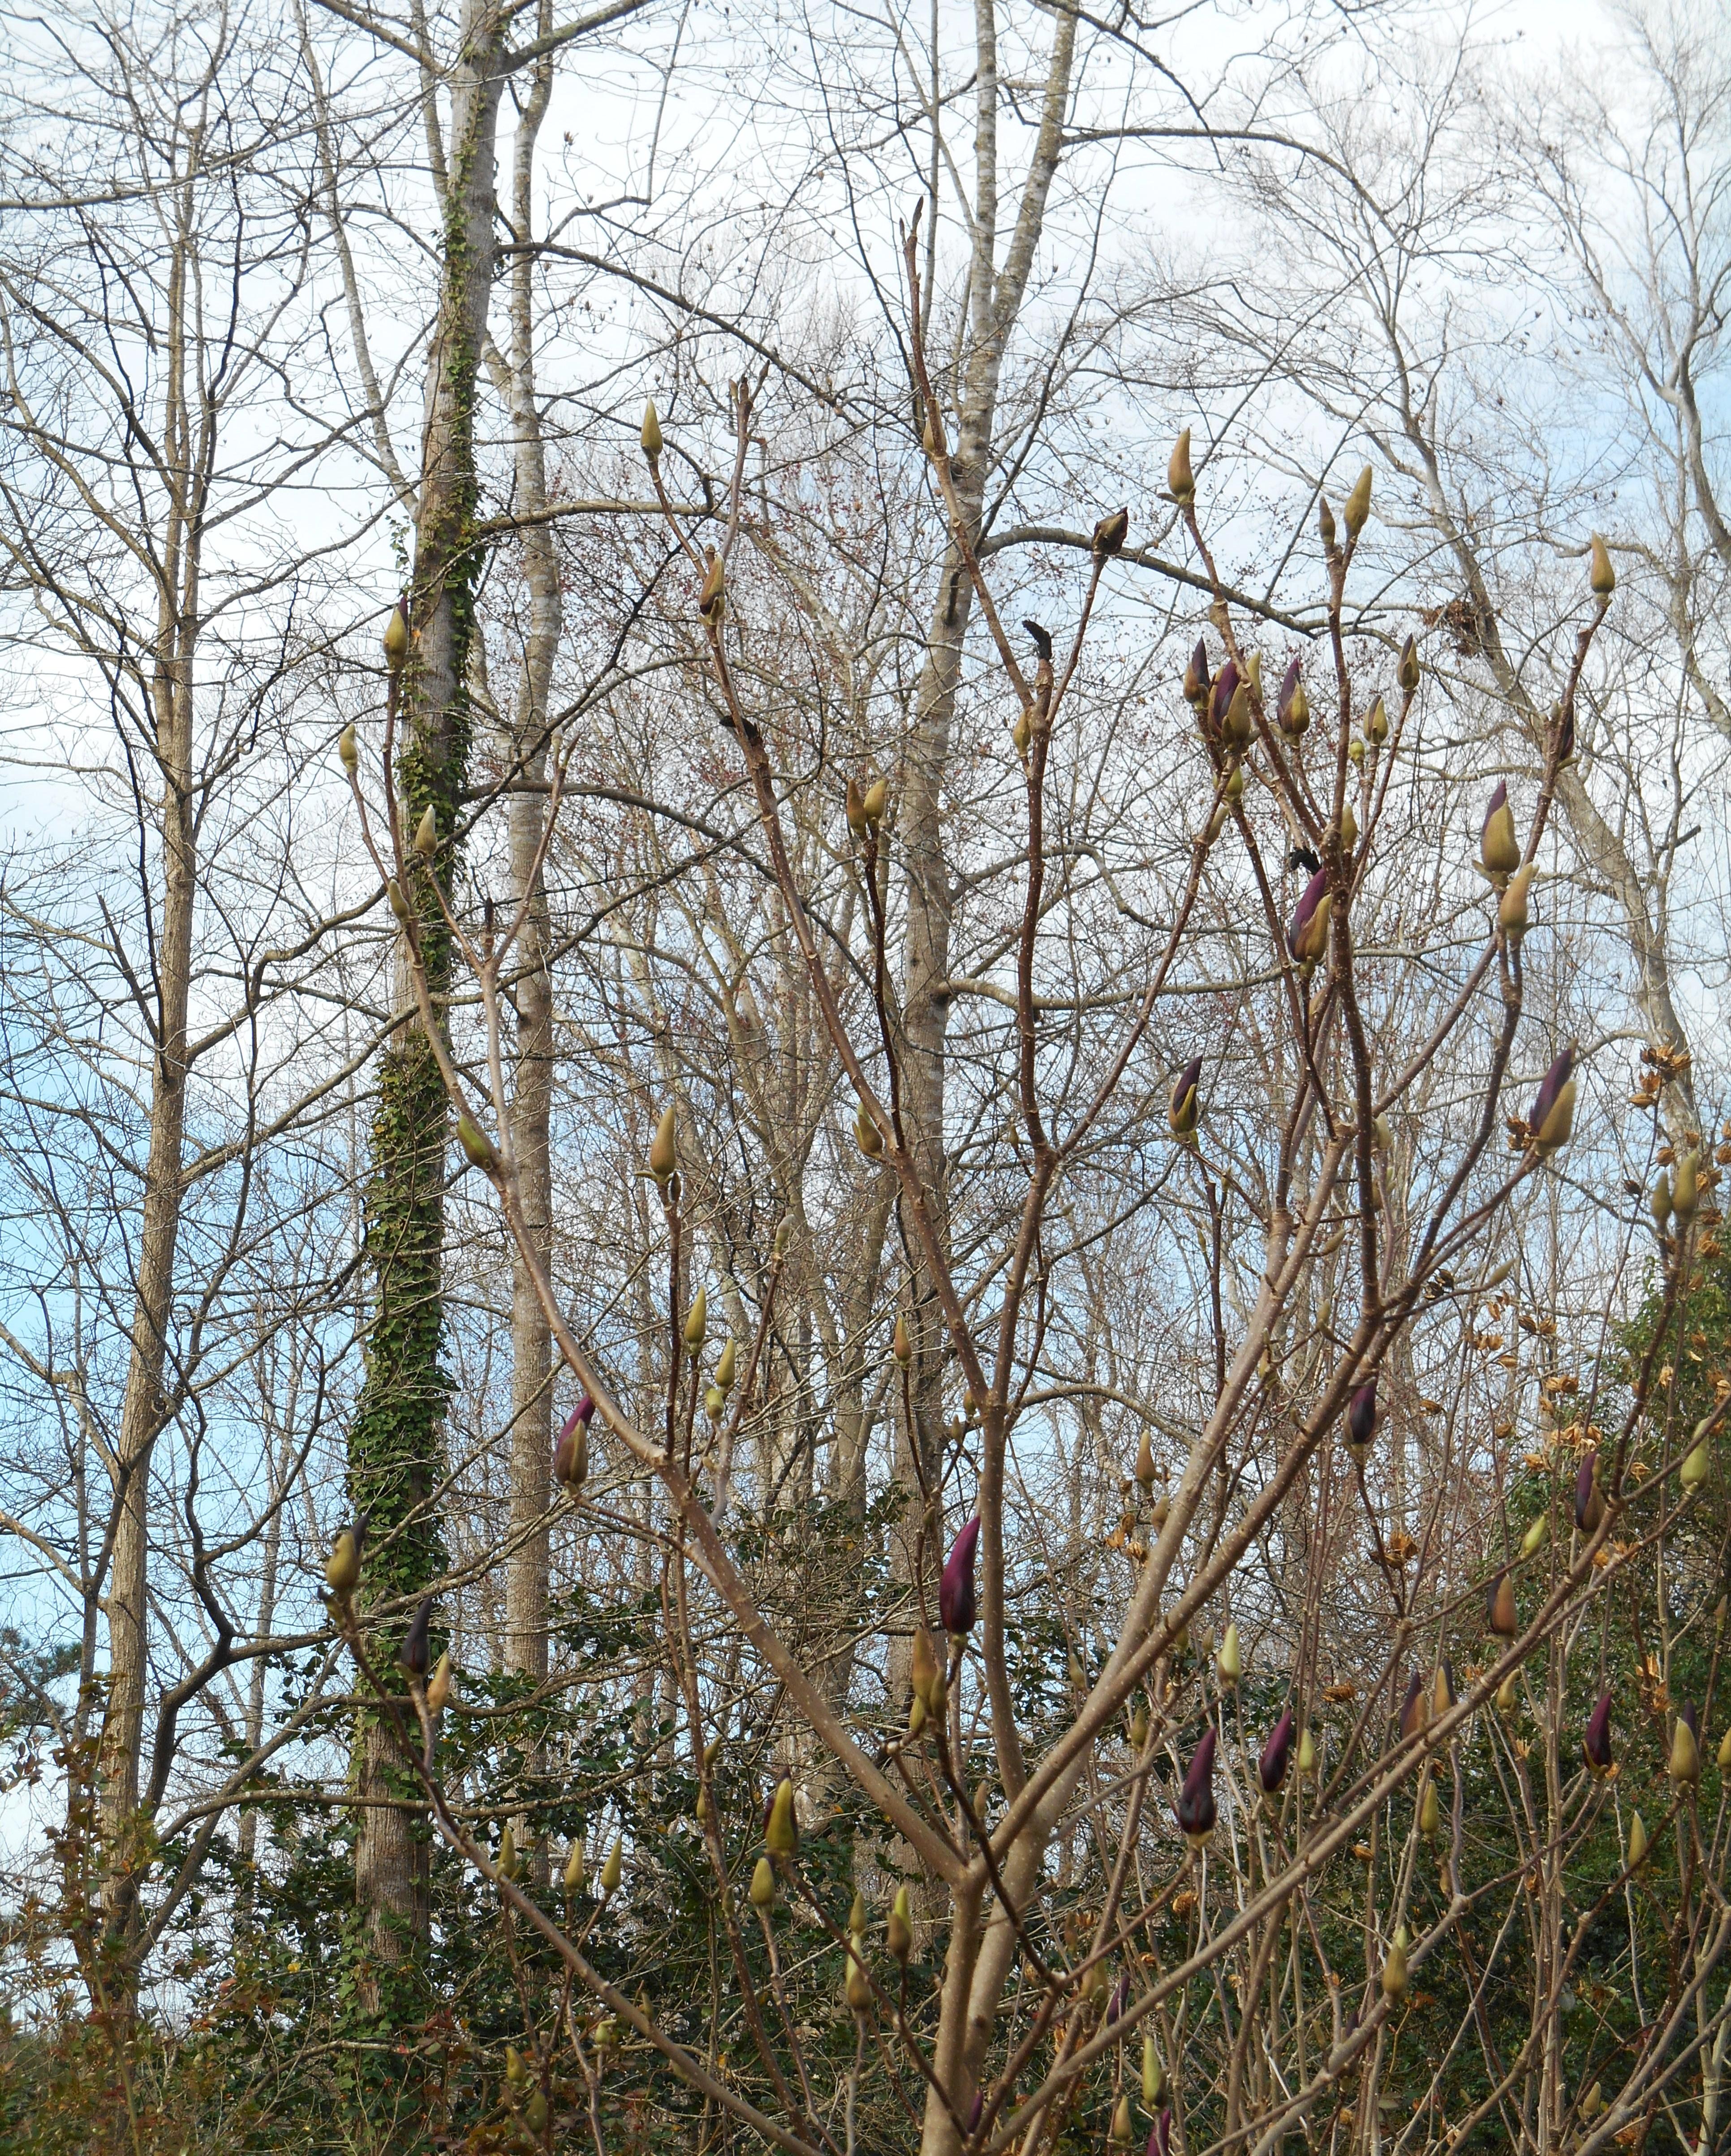 Magnolia lili